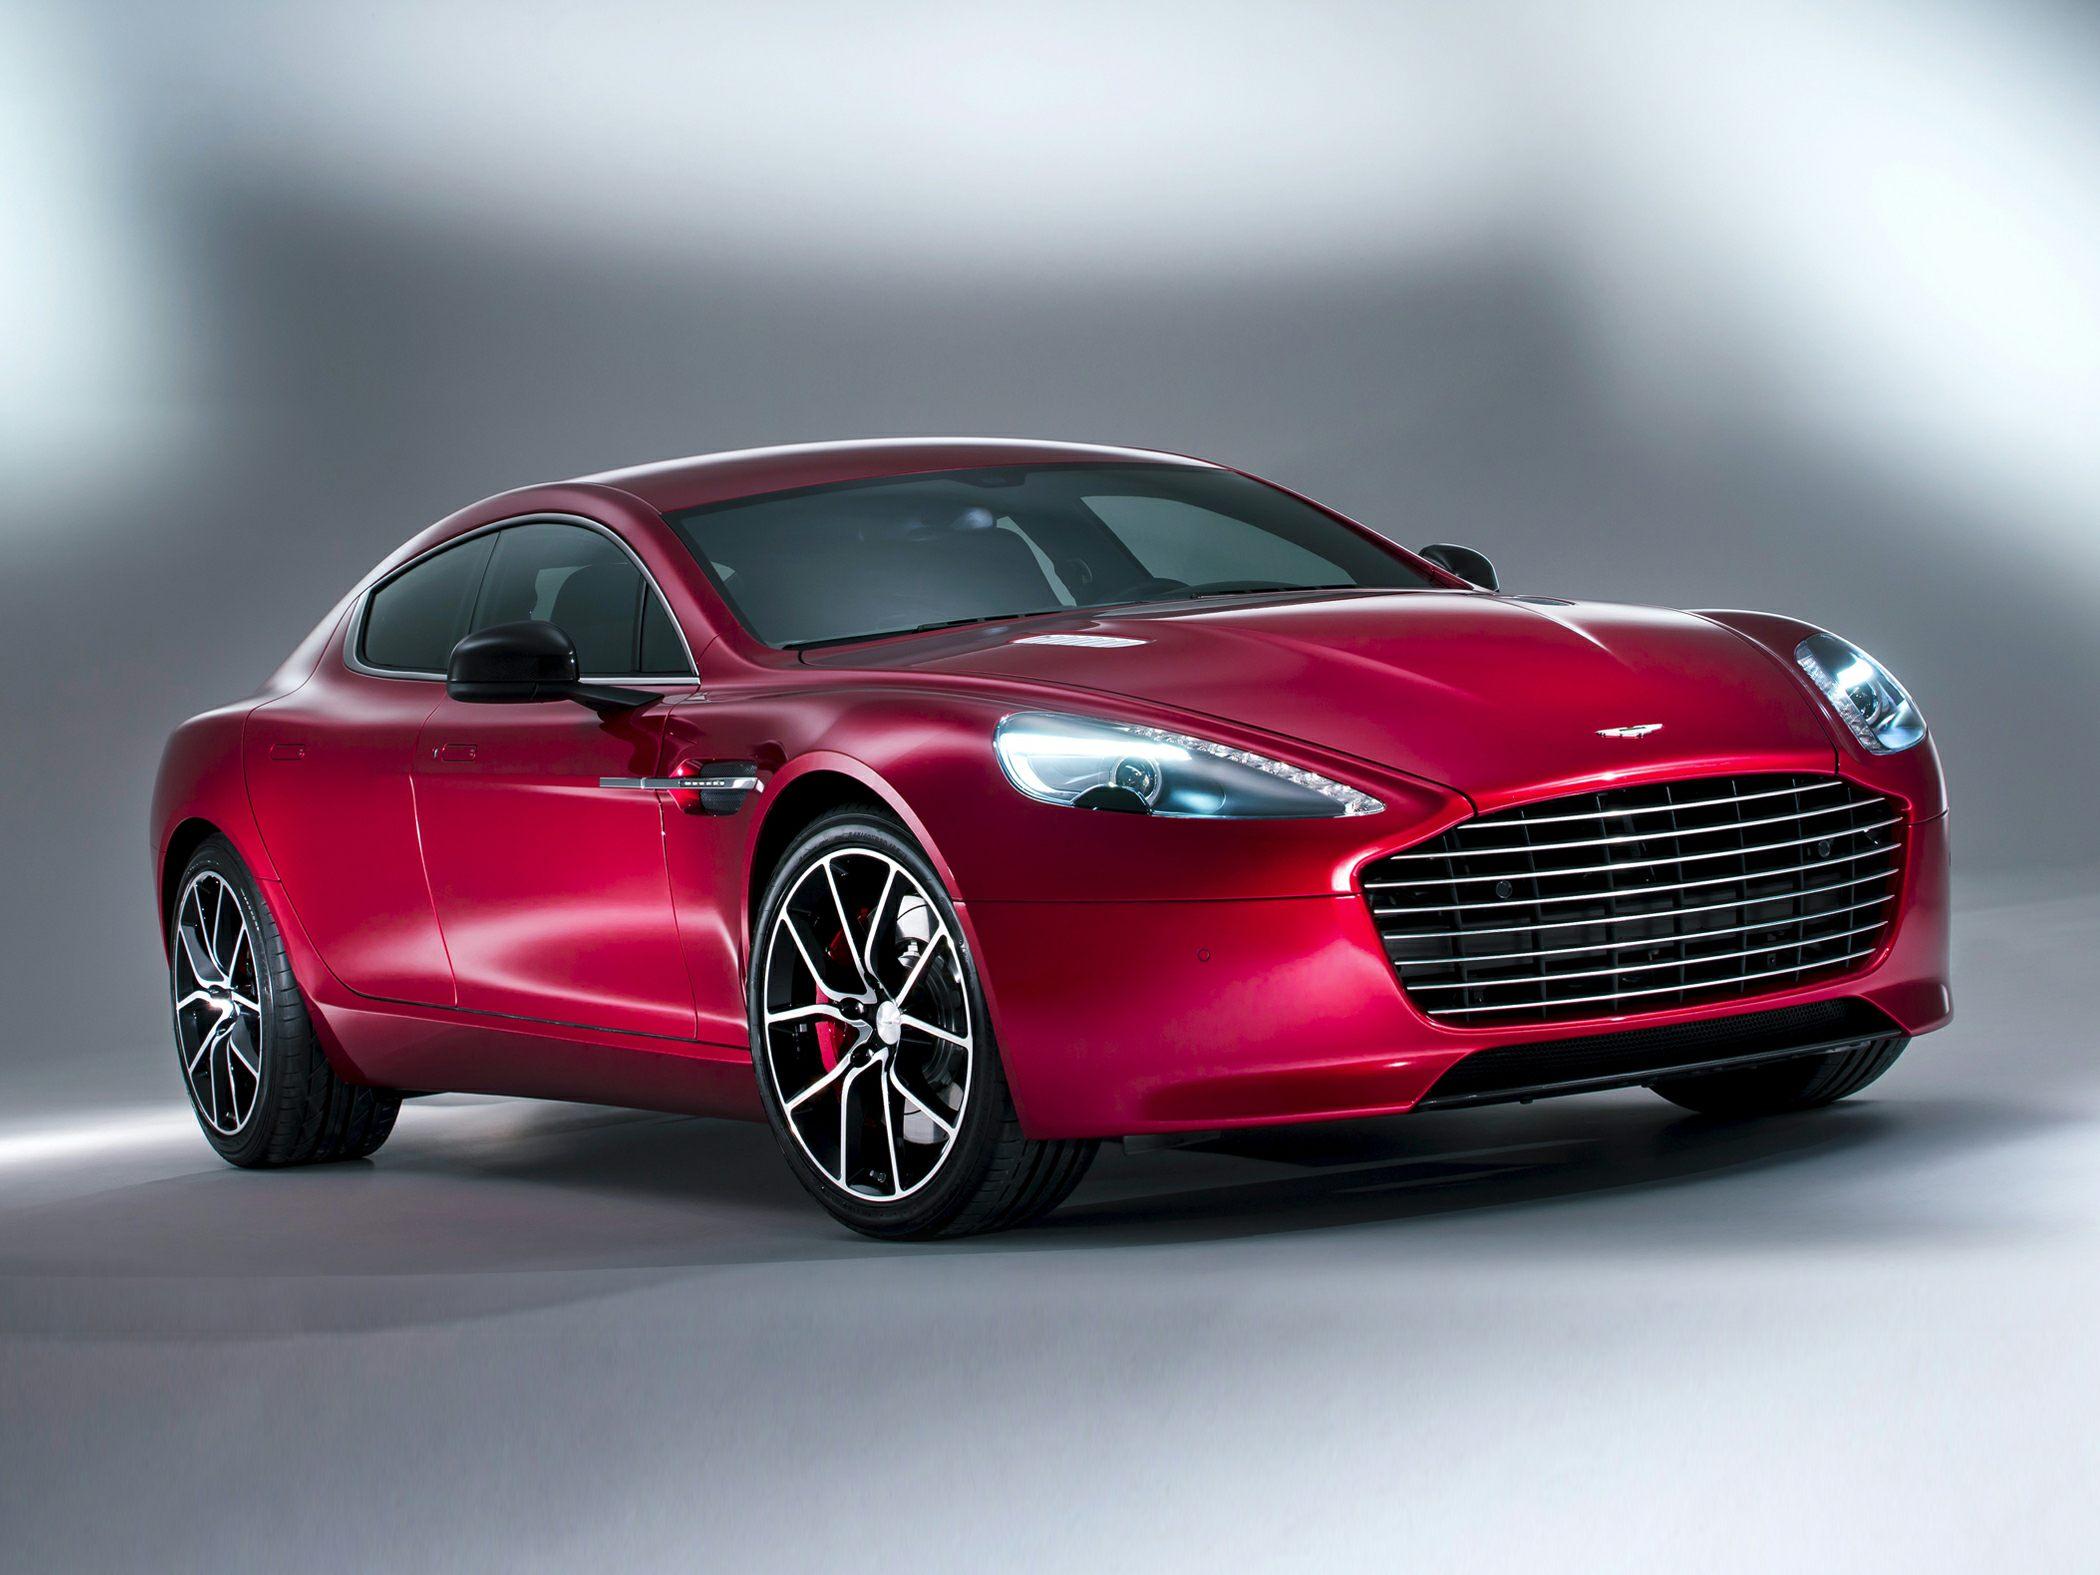 2017 Aston Martin Rapide S Information